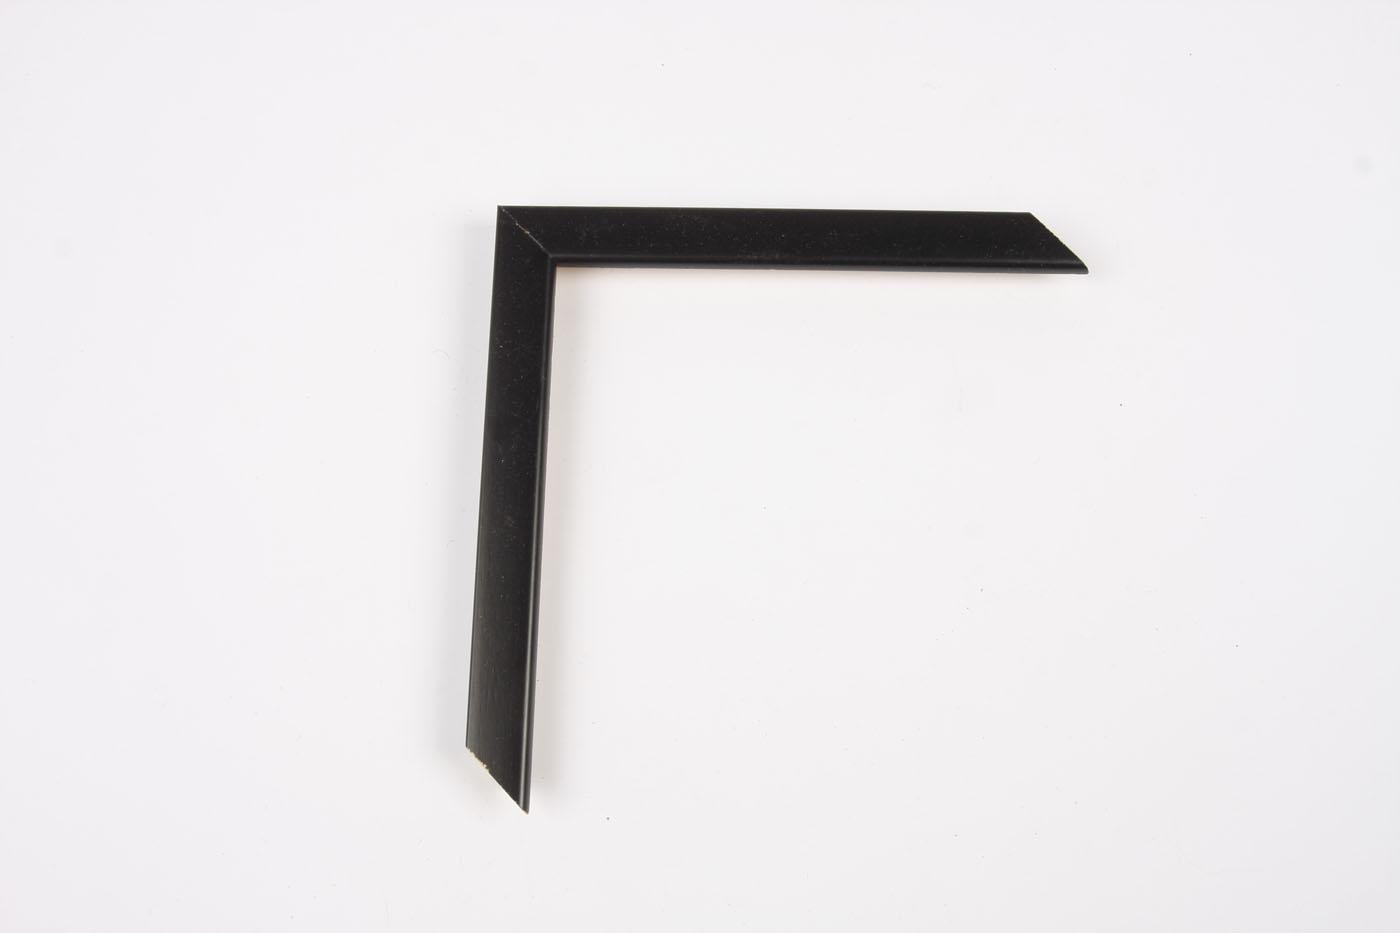 00290-000-negro-ancho1,8cm